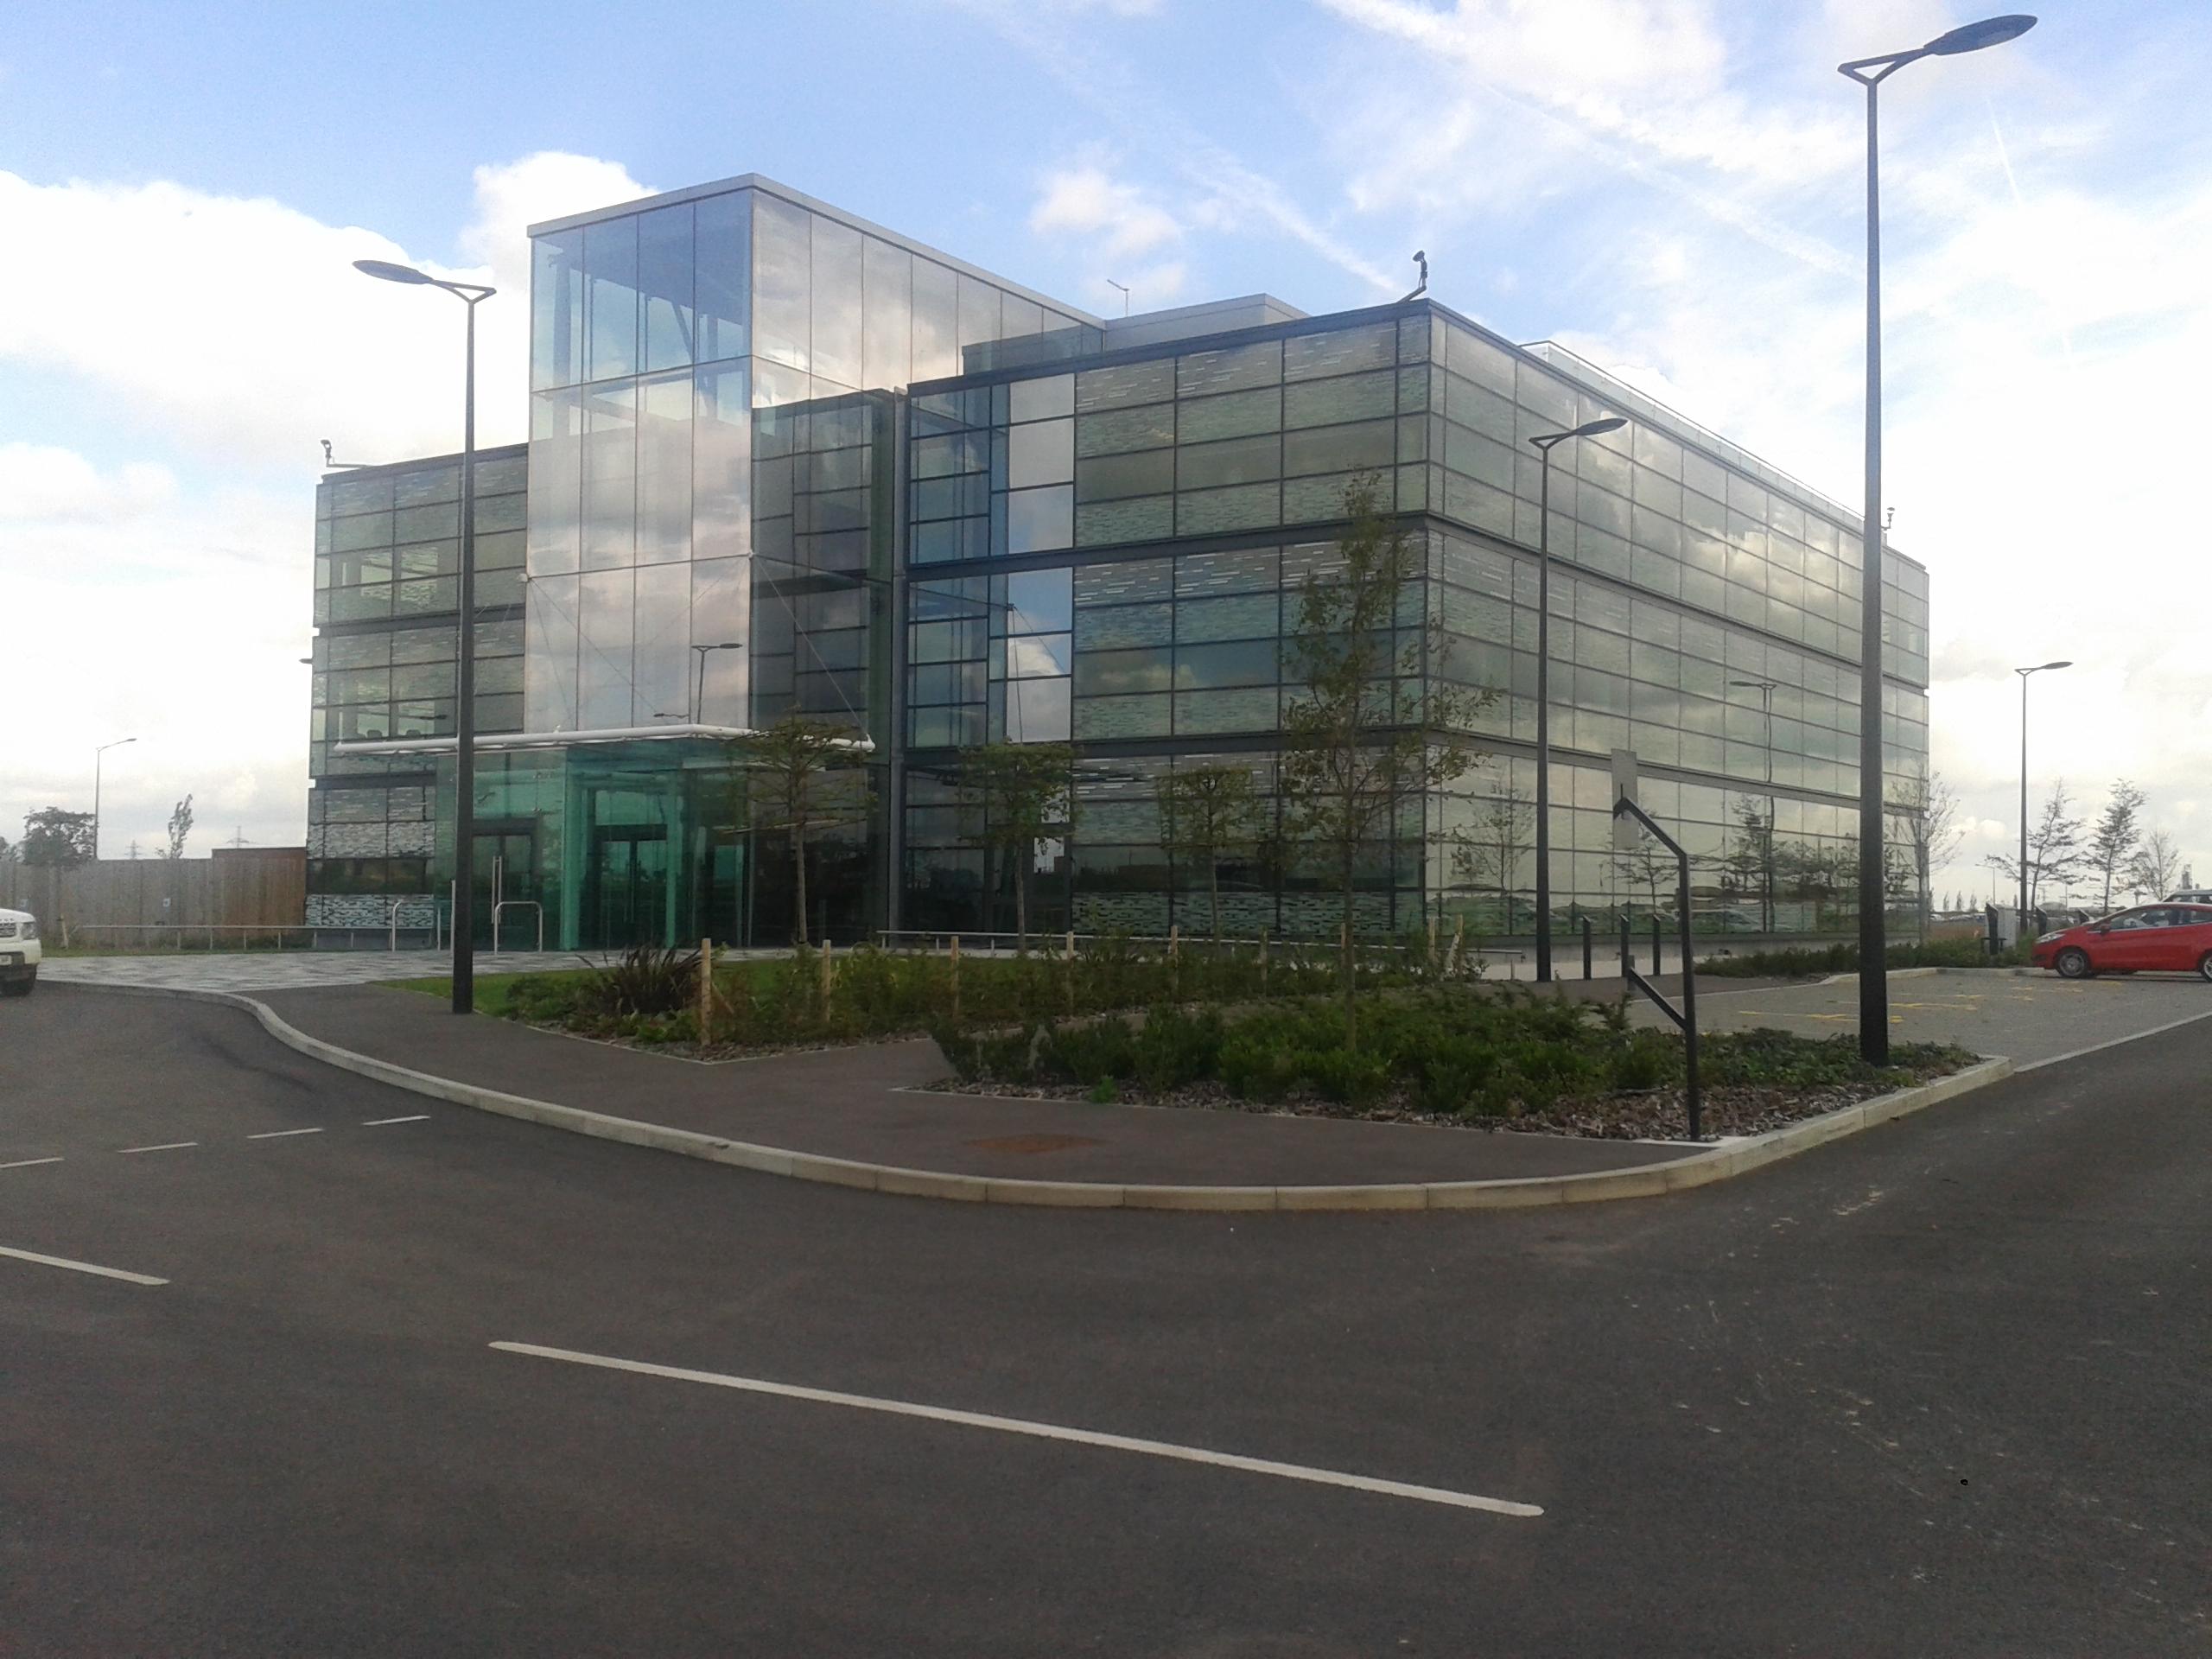 DP World London Gateway Project Admin Building